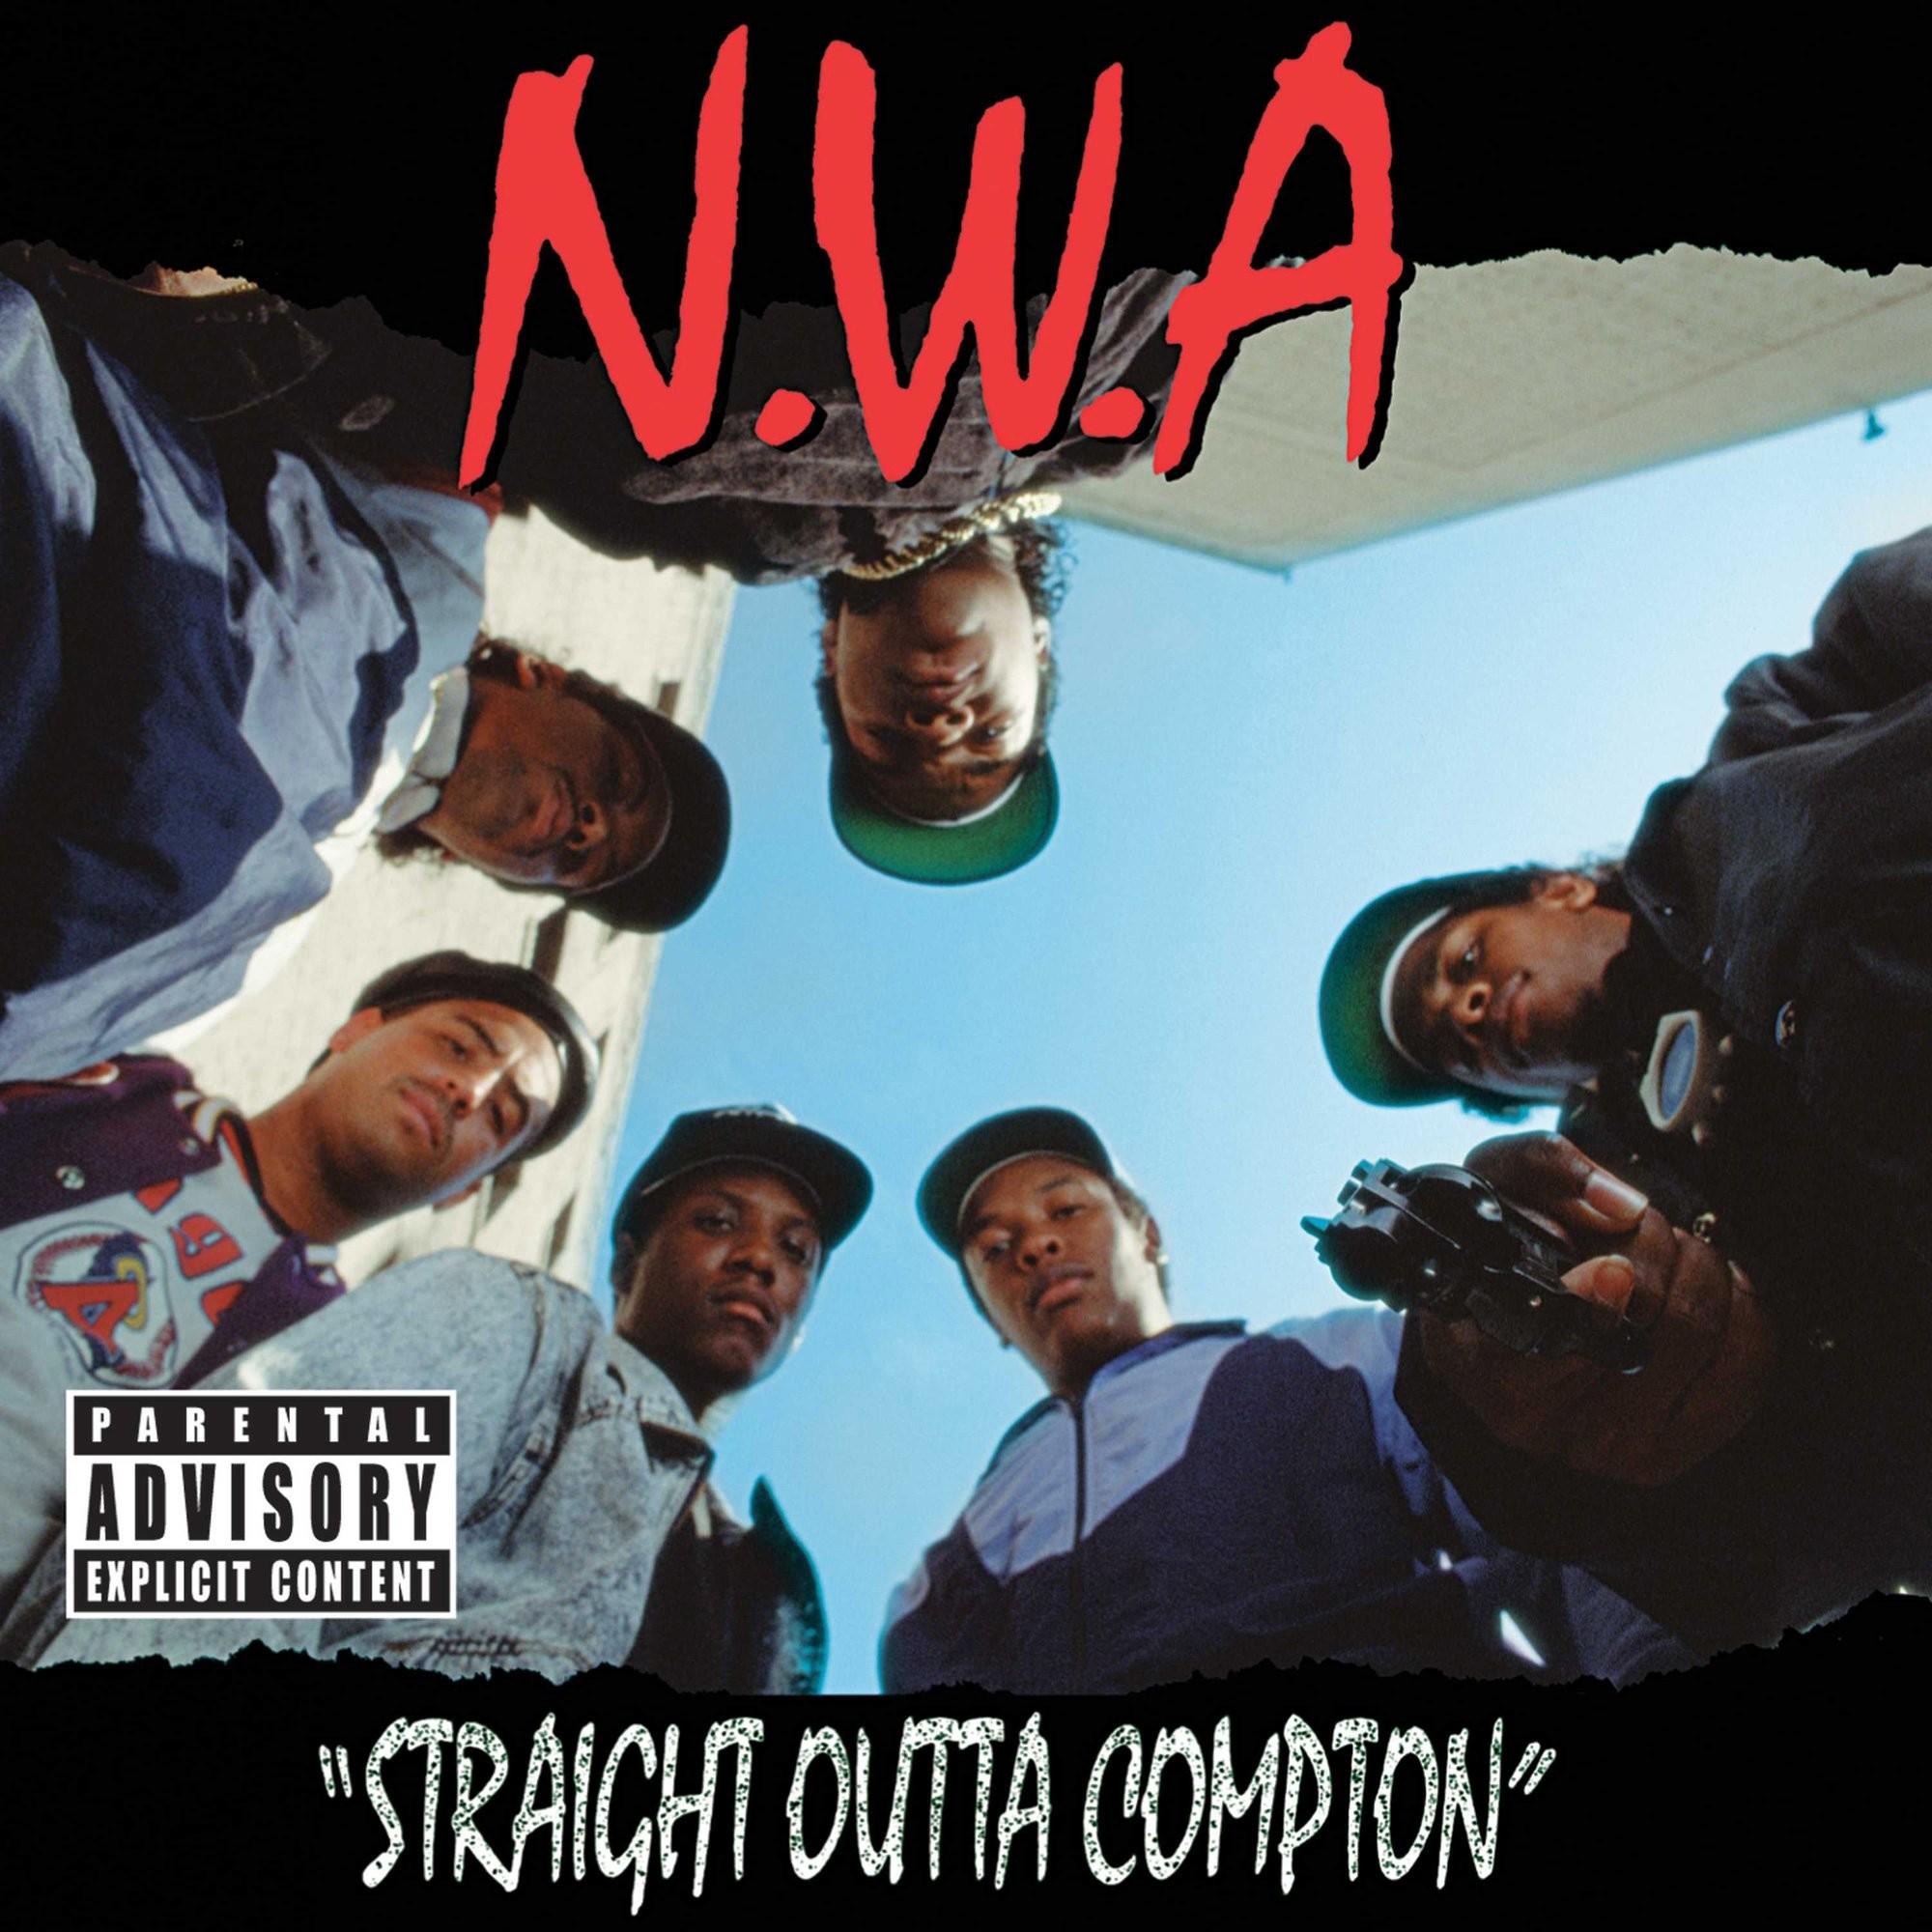 STRAIGHT OUTTA COMPTON rap rapper hip hop gangsta nwa biography drama music  1soc poster wallpaper | | 789317 | WallpaperUP